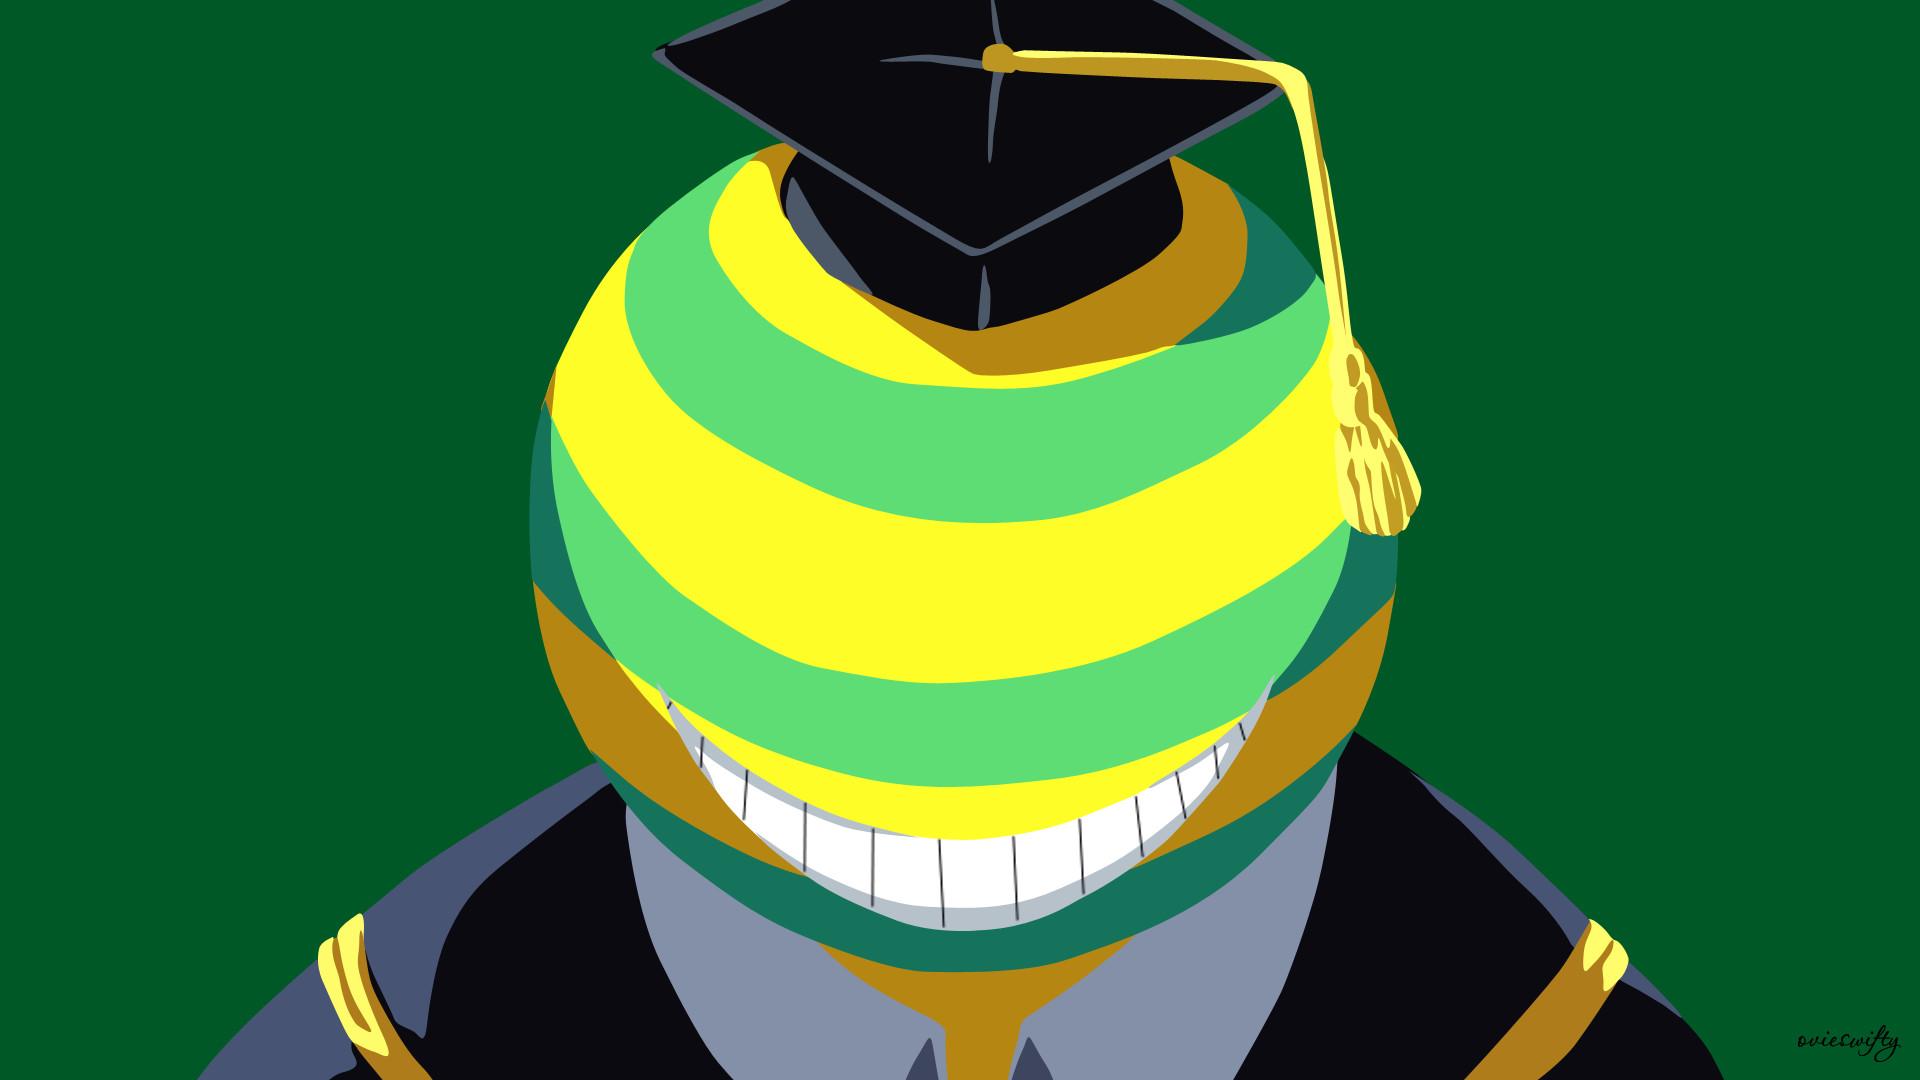 … Koro-sensei (Mockery) | Assassination Classroom by ovieswifty